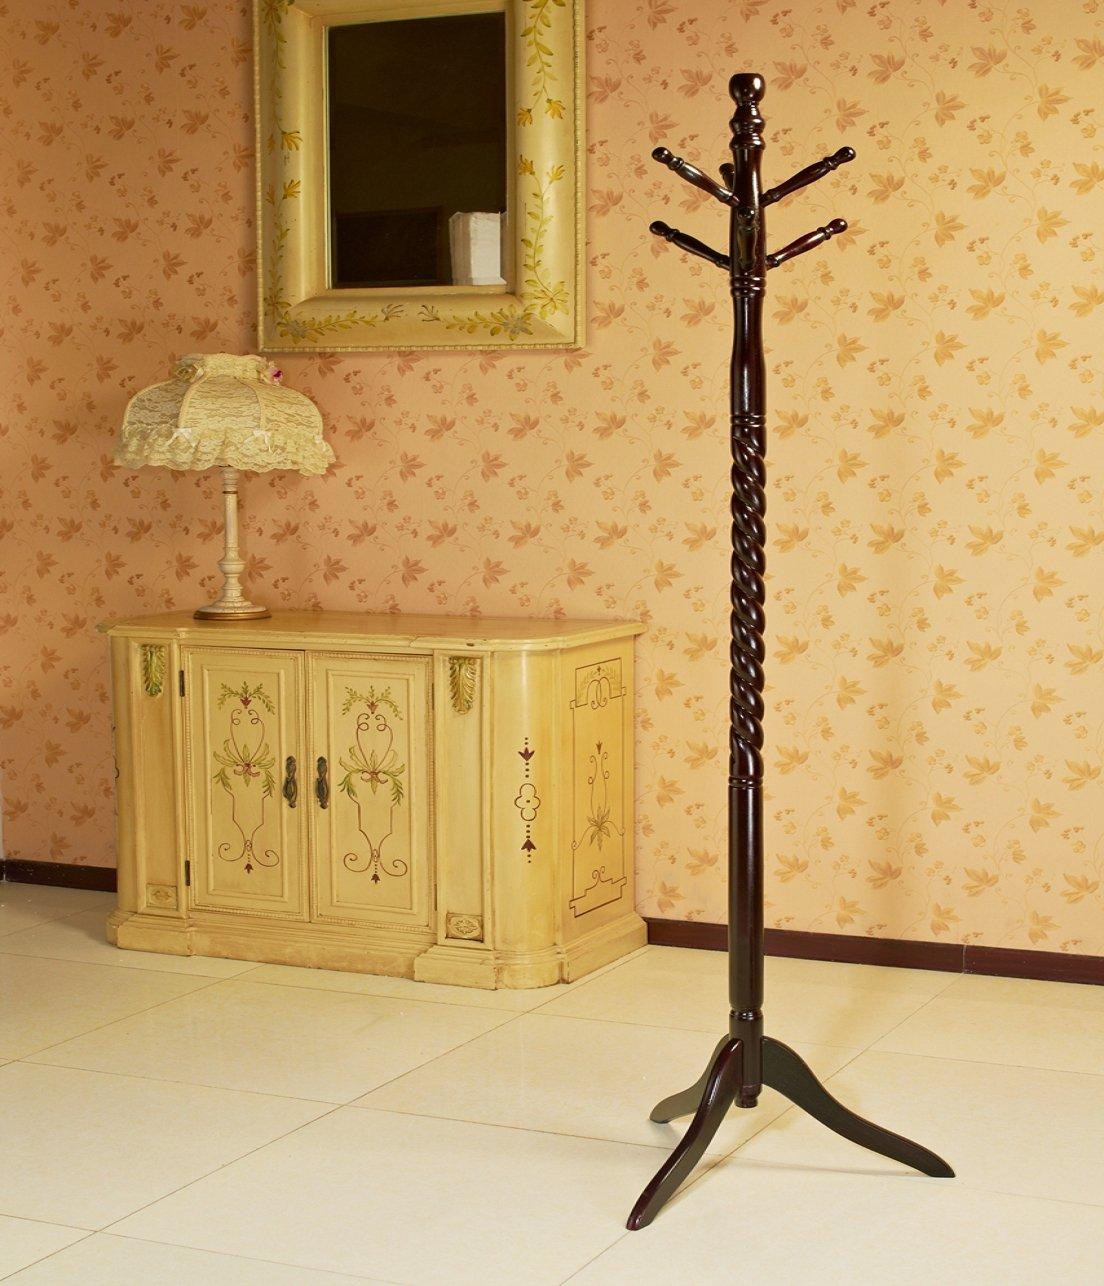 Amazon.com: Frenchi Furniture Swivel Coat Rack Stand in Cherry ...